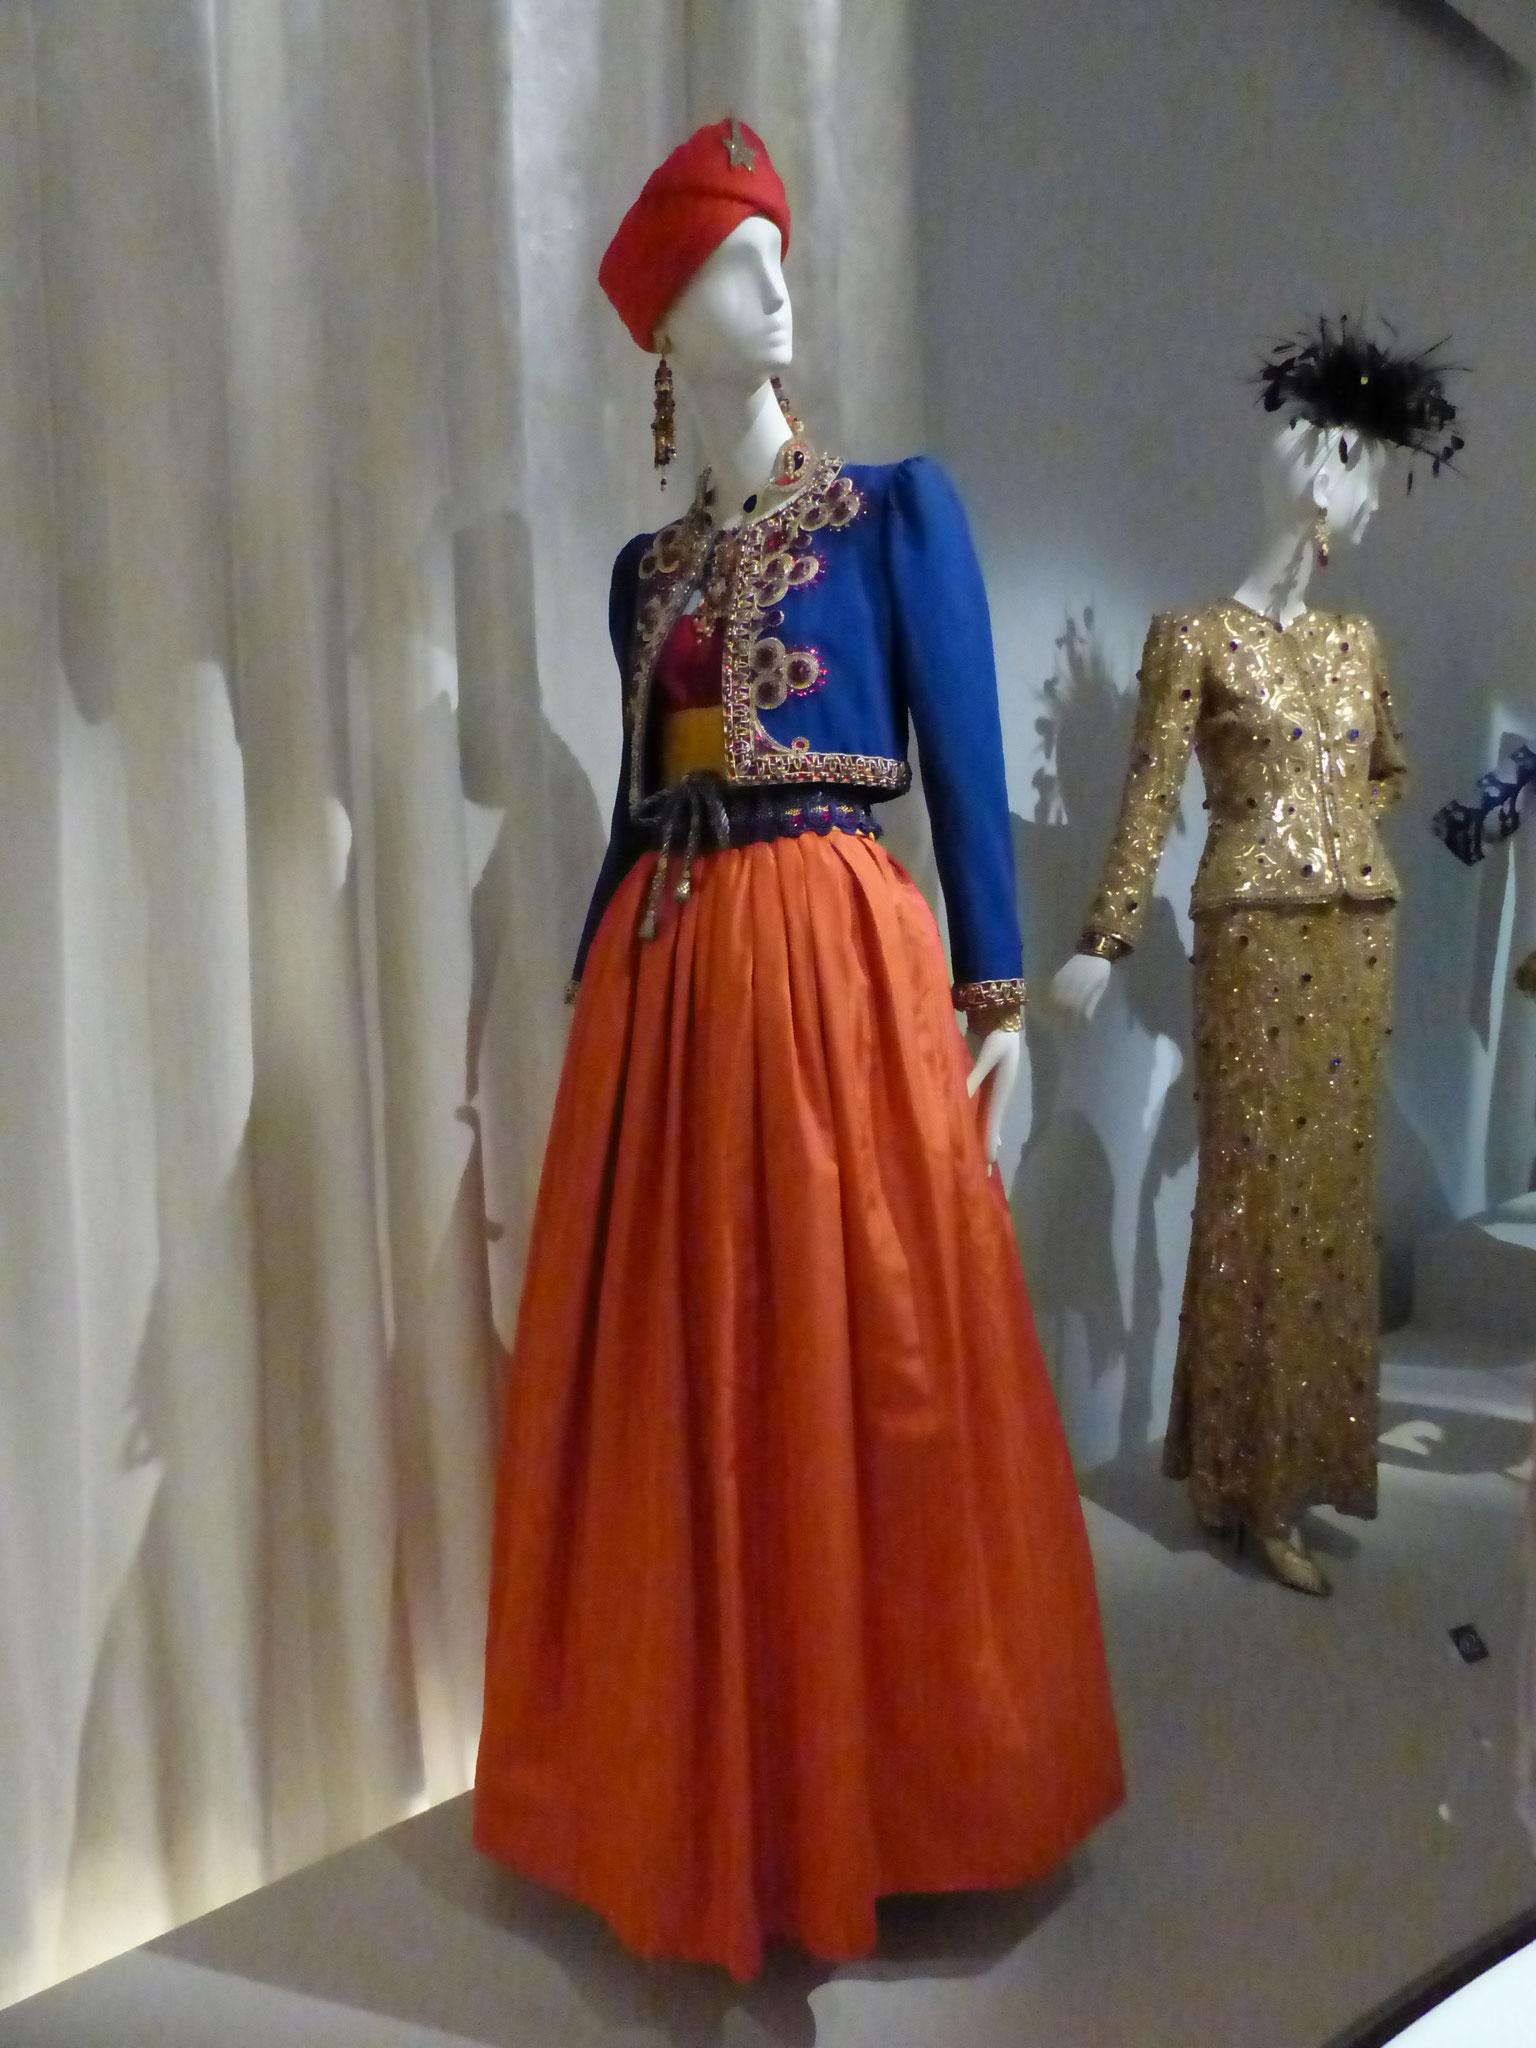 Veste et robe de gros grains de soie